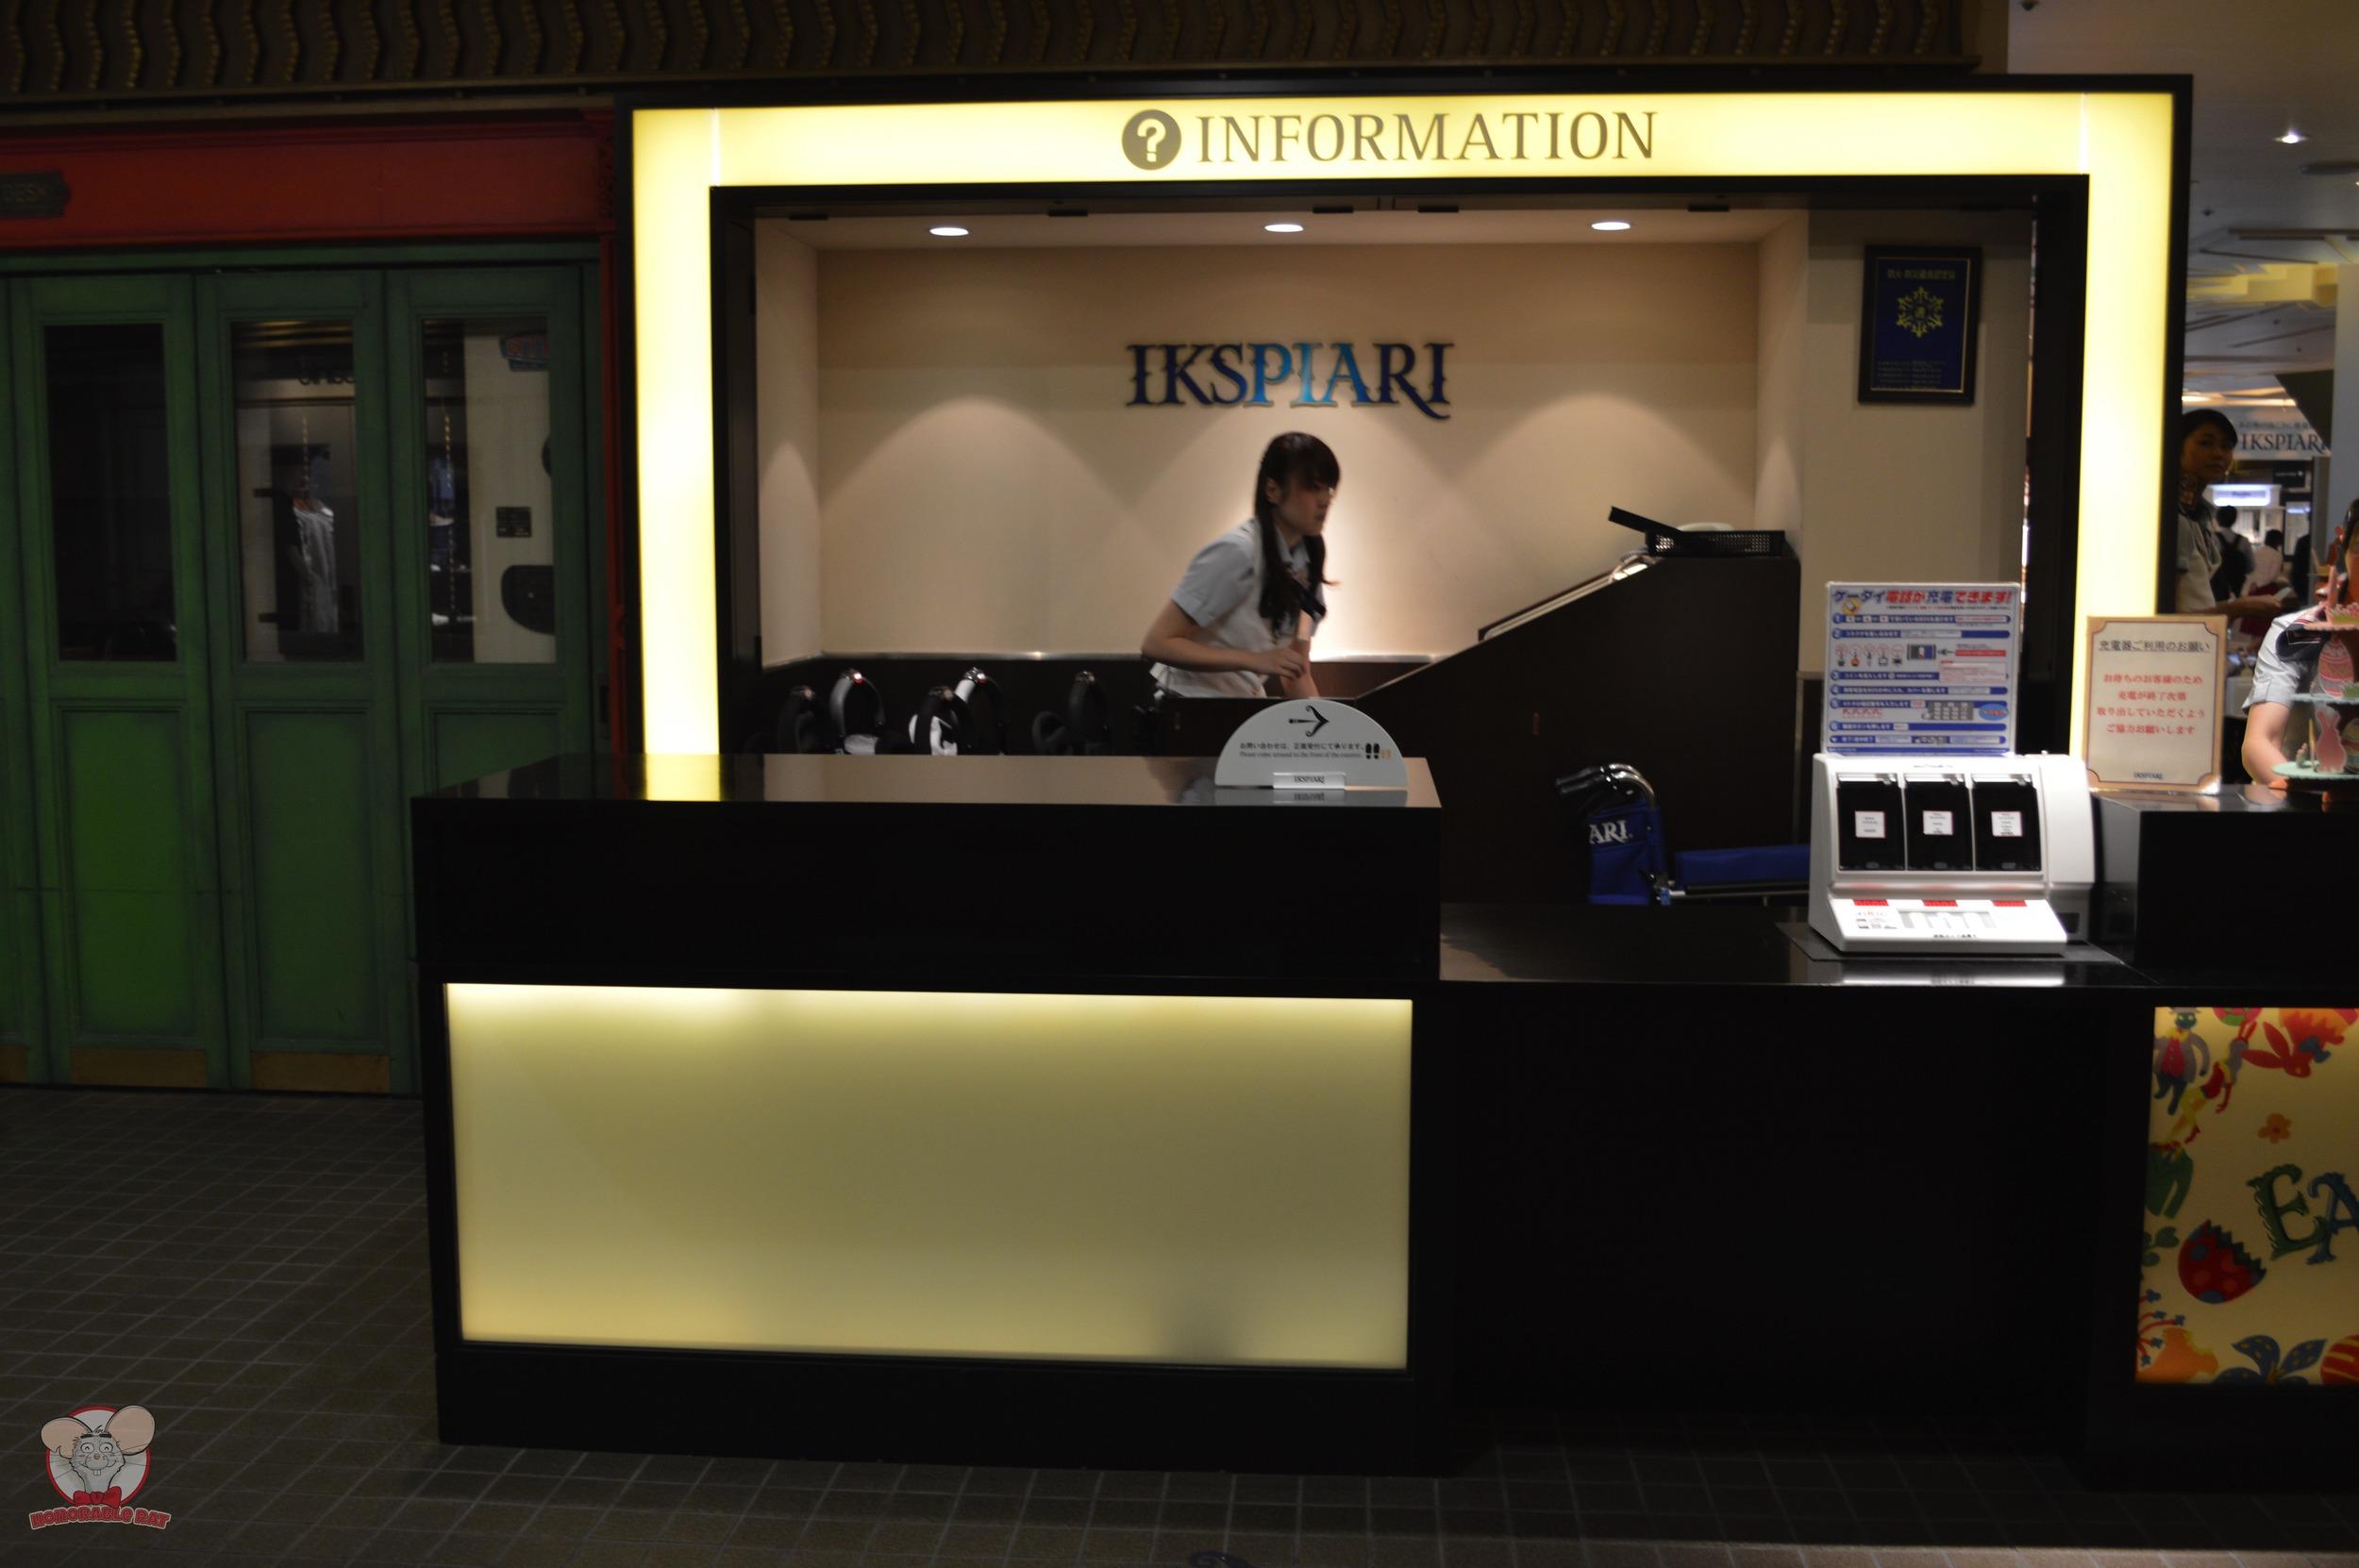 Phone Charging Station at Ikspiari Information Counter